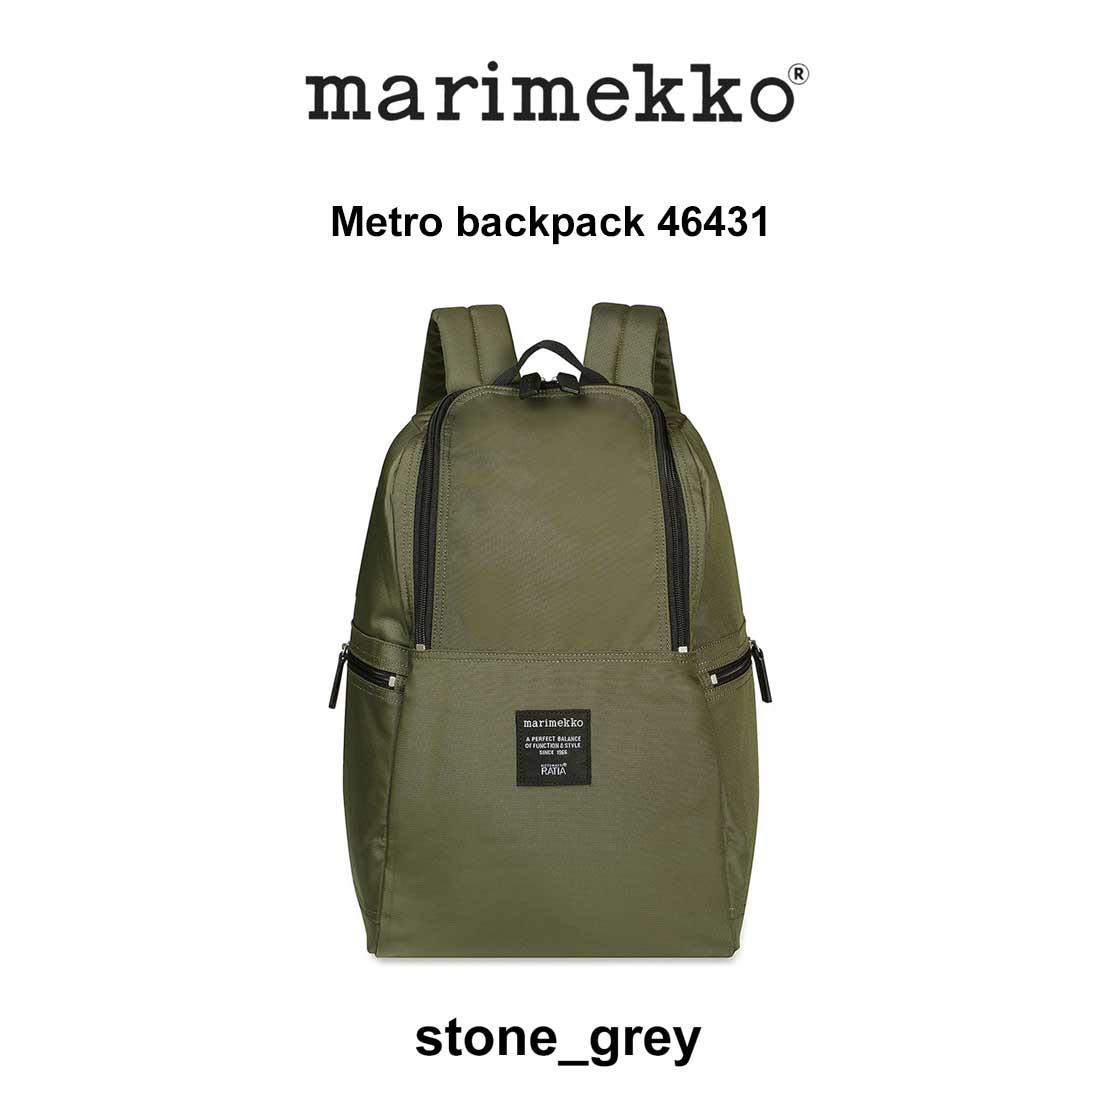 (SALE)marimekko(マリメッコ)バッグ バックパック リュック メトロ Metro backpack 46431